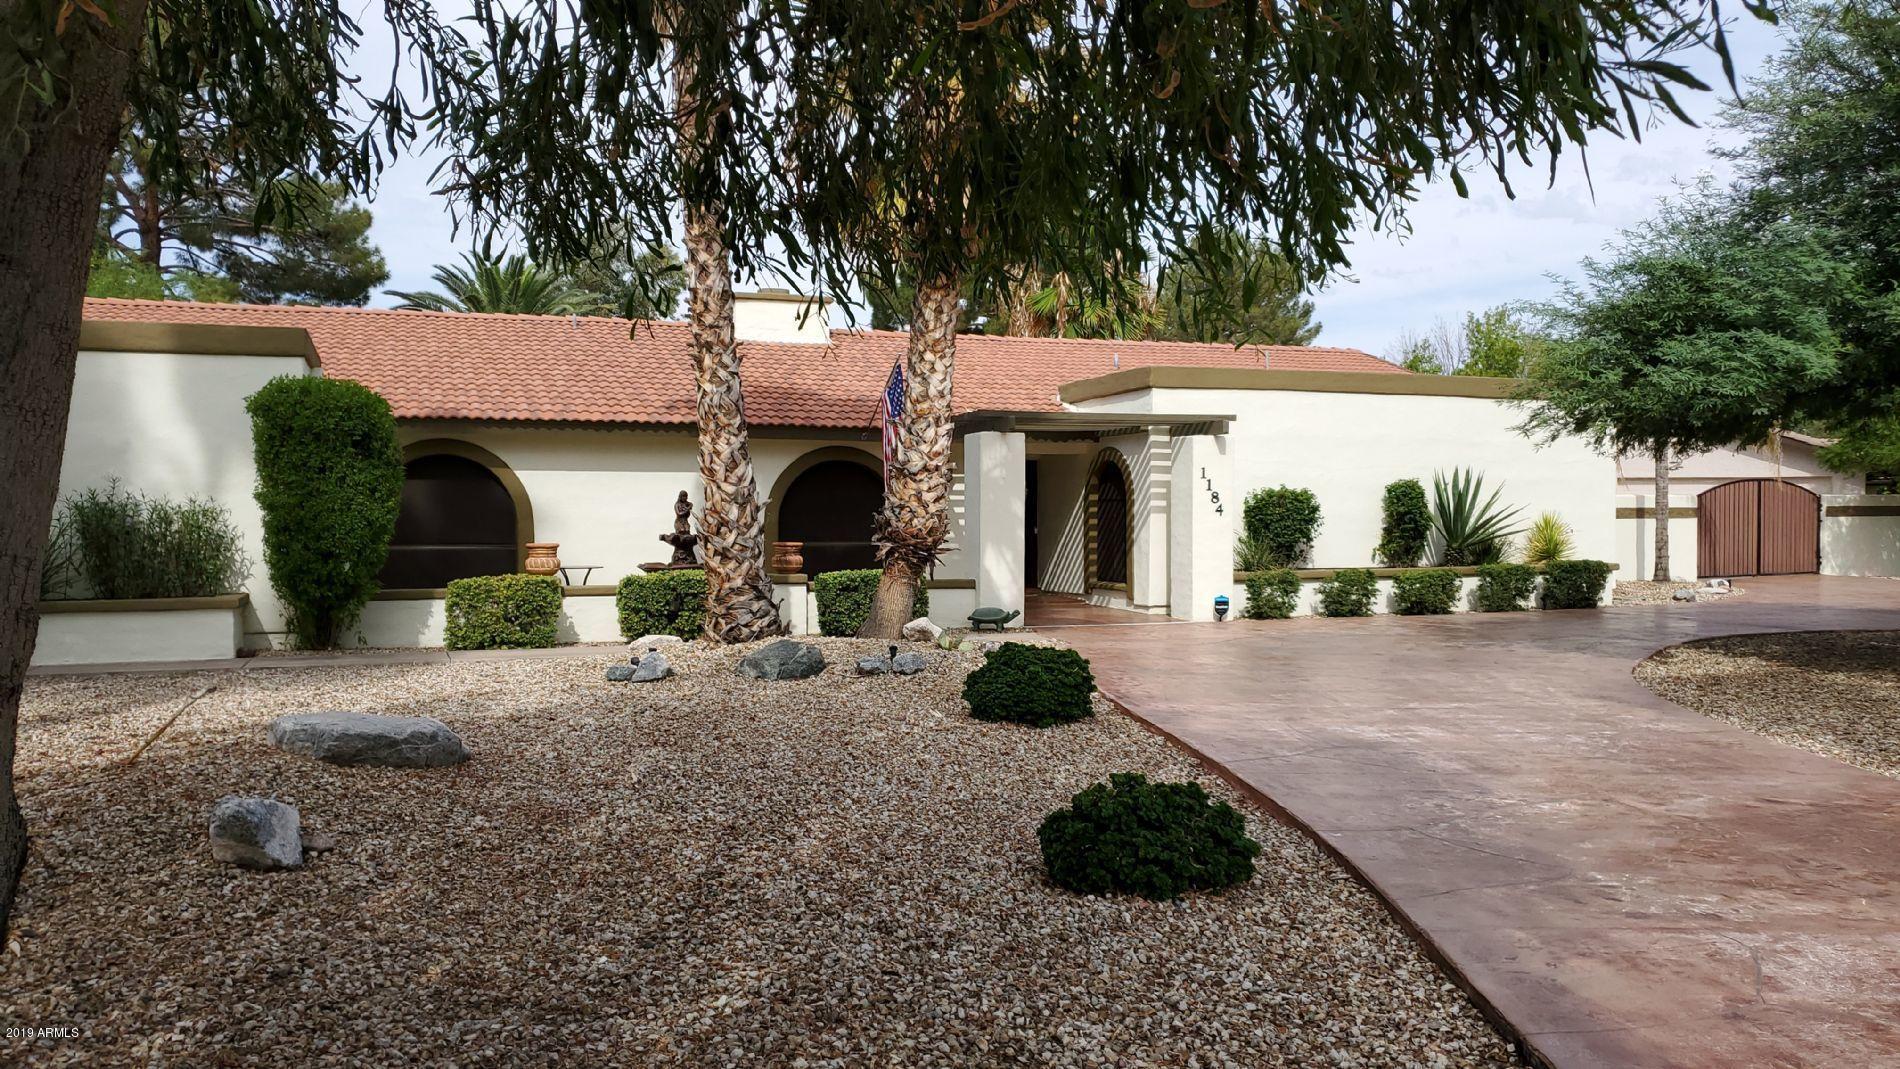 Photo of 1184 N VILLA NUEVA Drive, Litchfield Park, AZ 85340